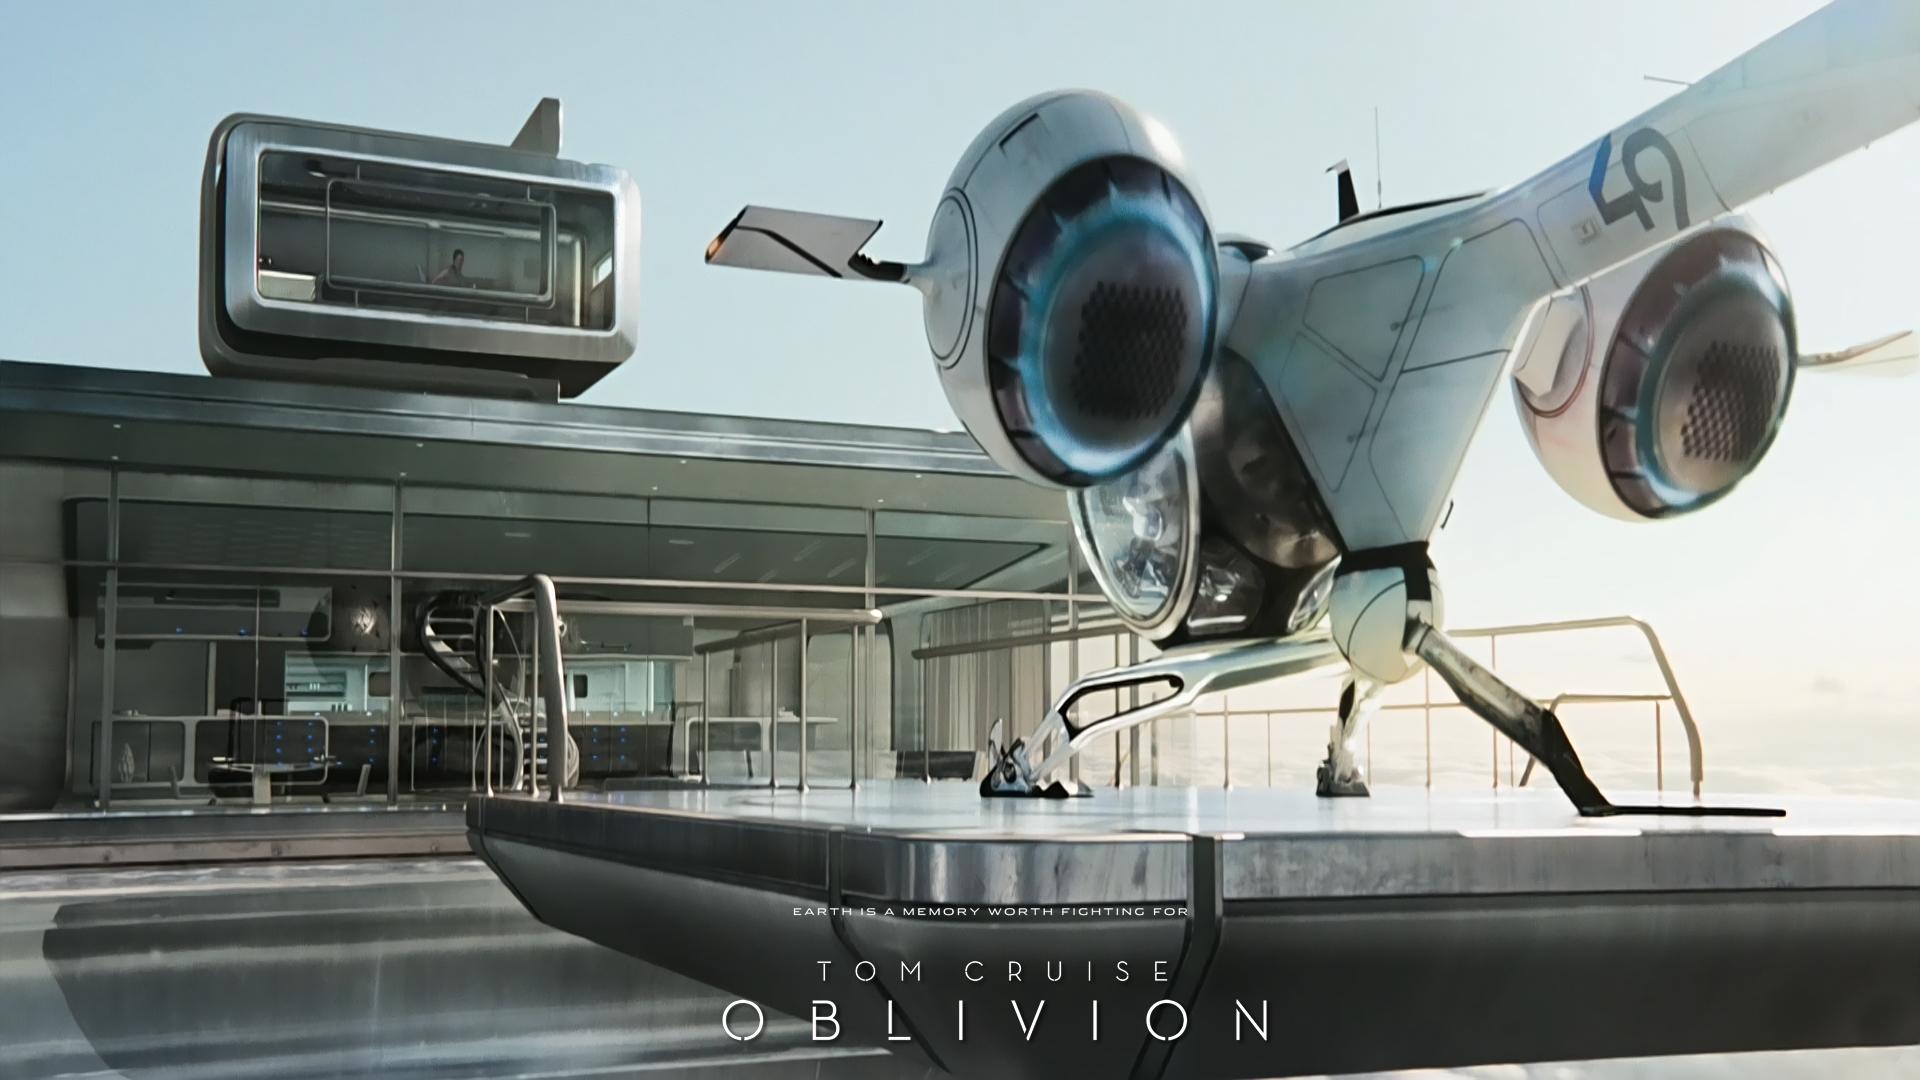 Tom-Cruise-Oblivion-wallpapers-2.jpg